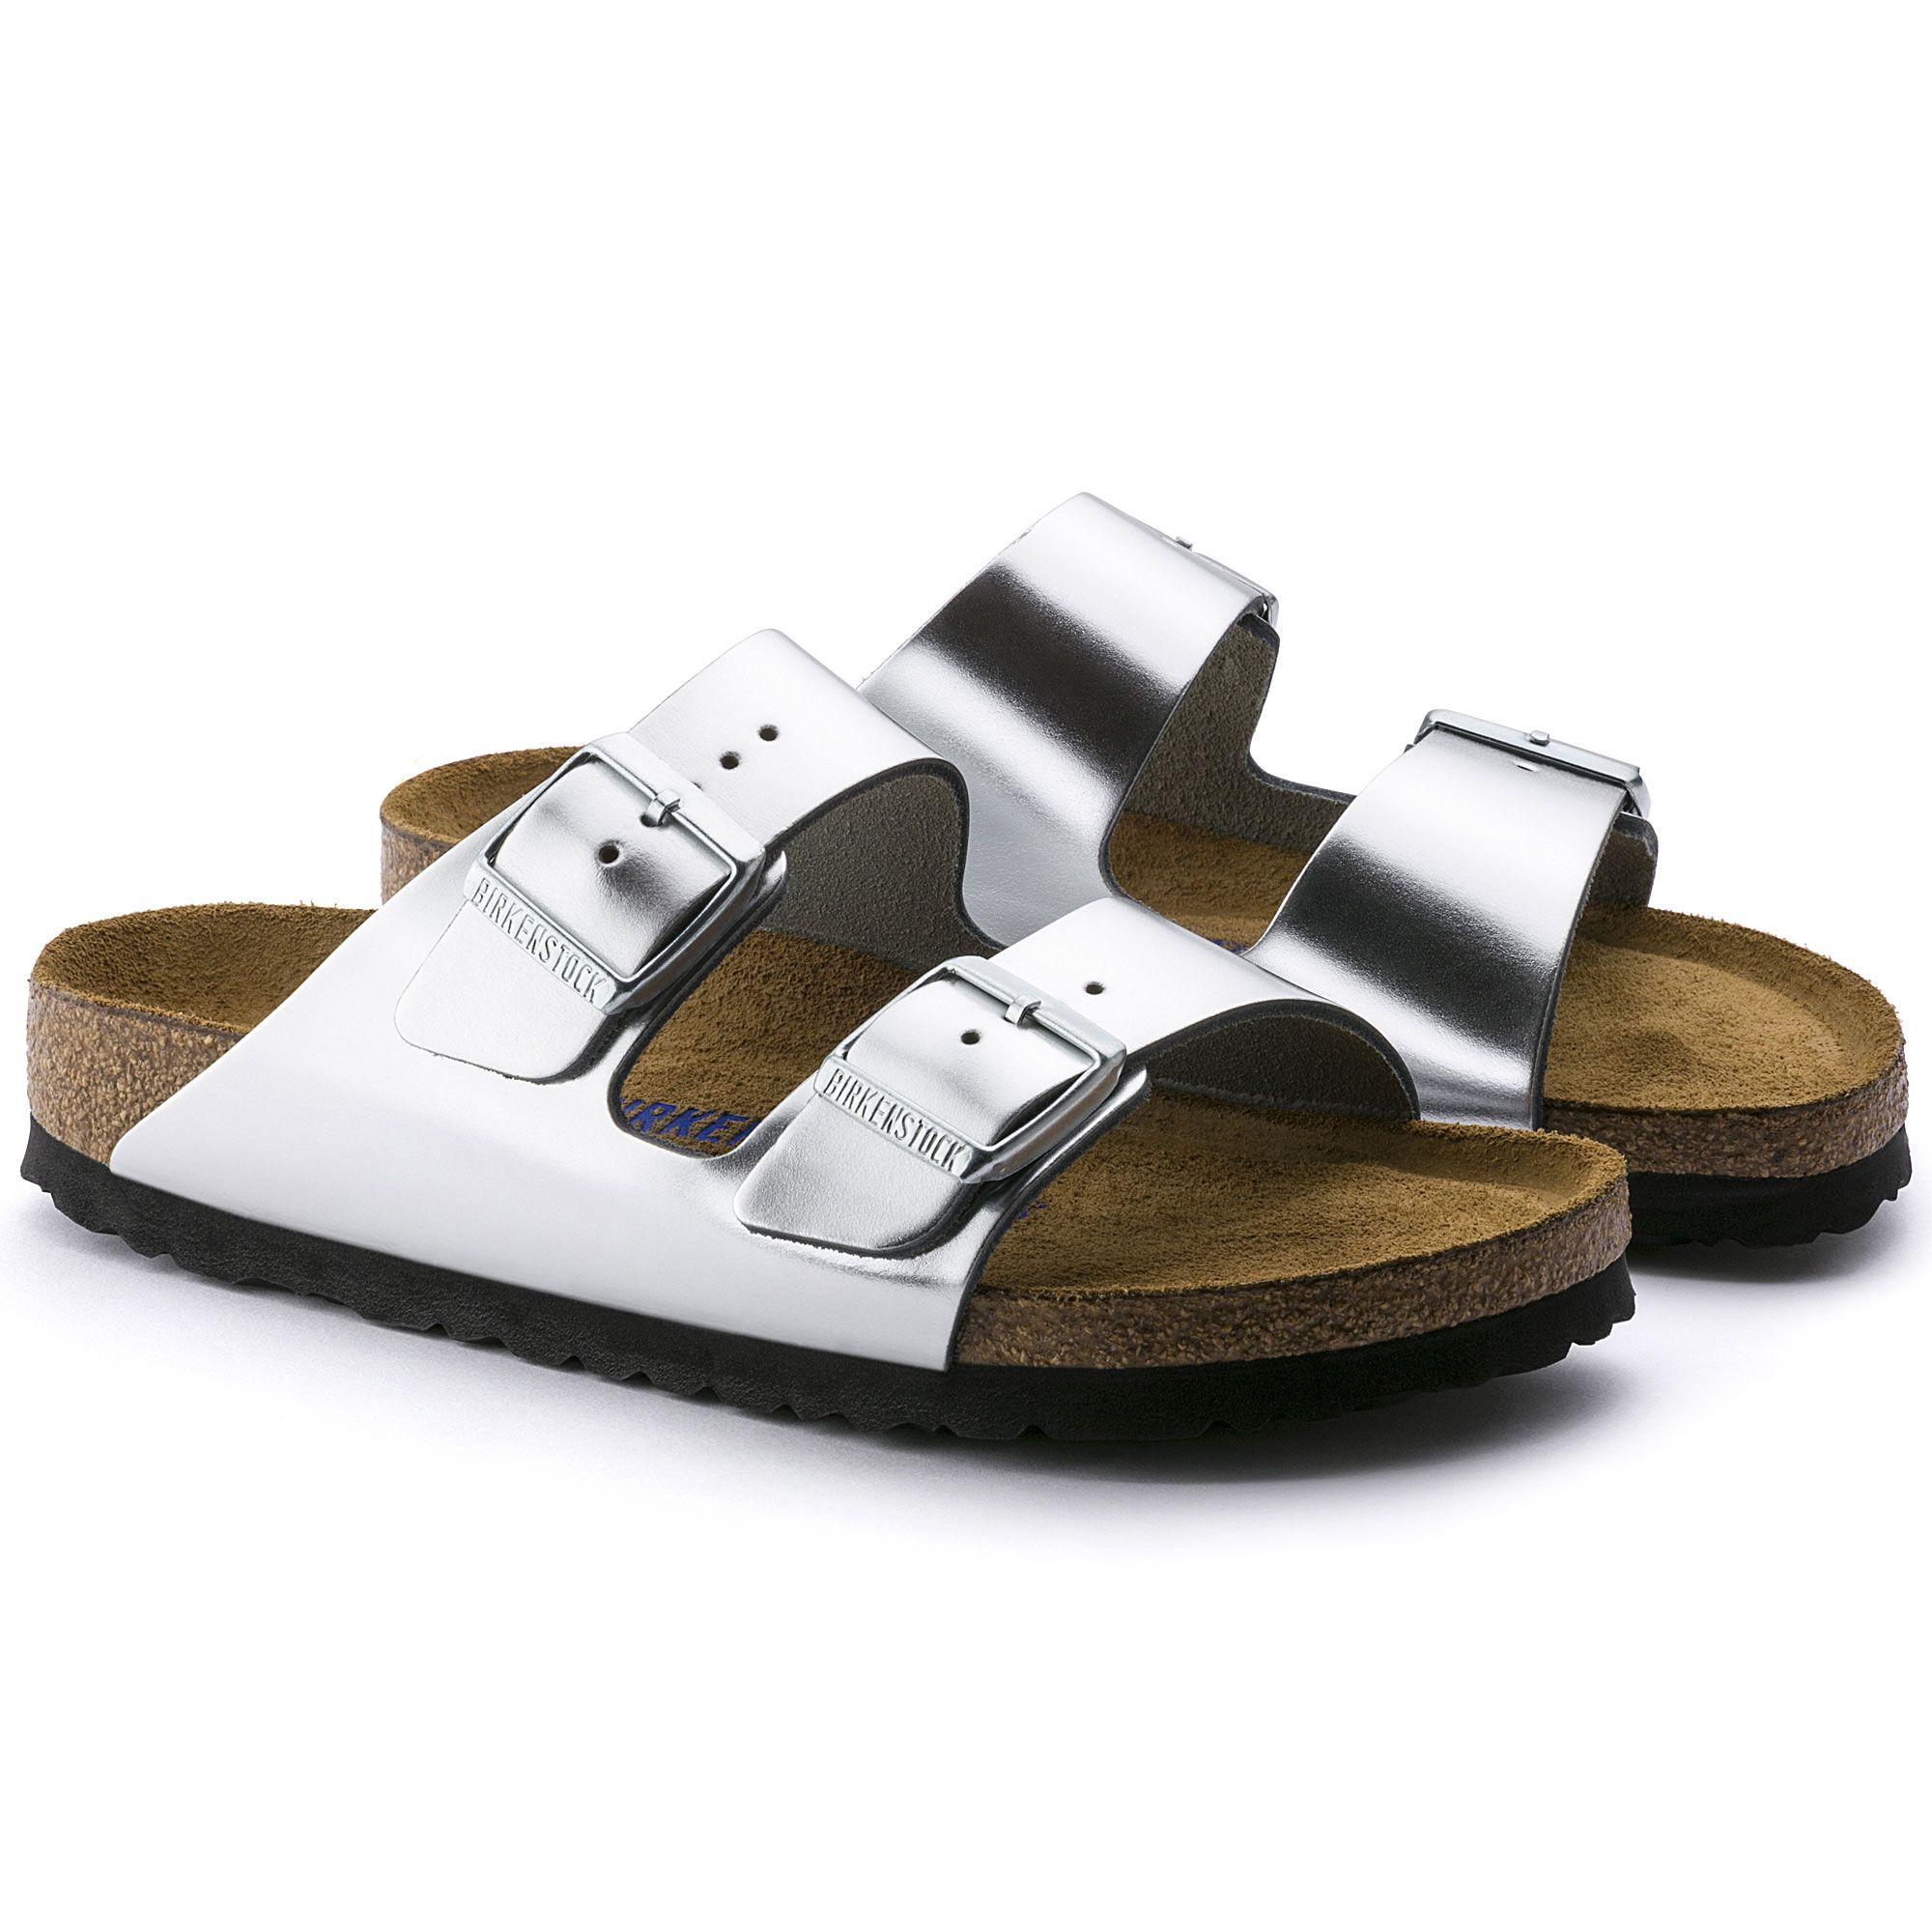 5d255d794e78 Arizona Soft Footbed Metallic Silver Leather